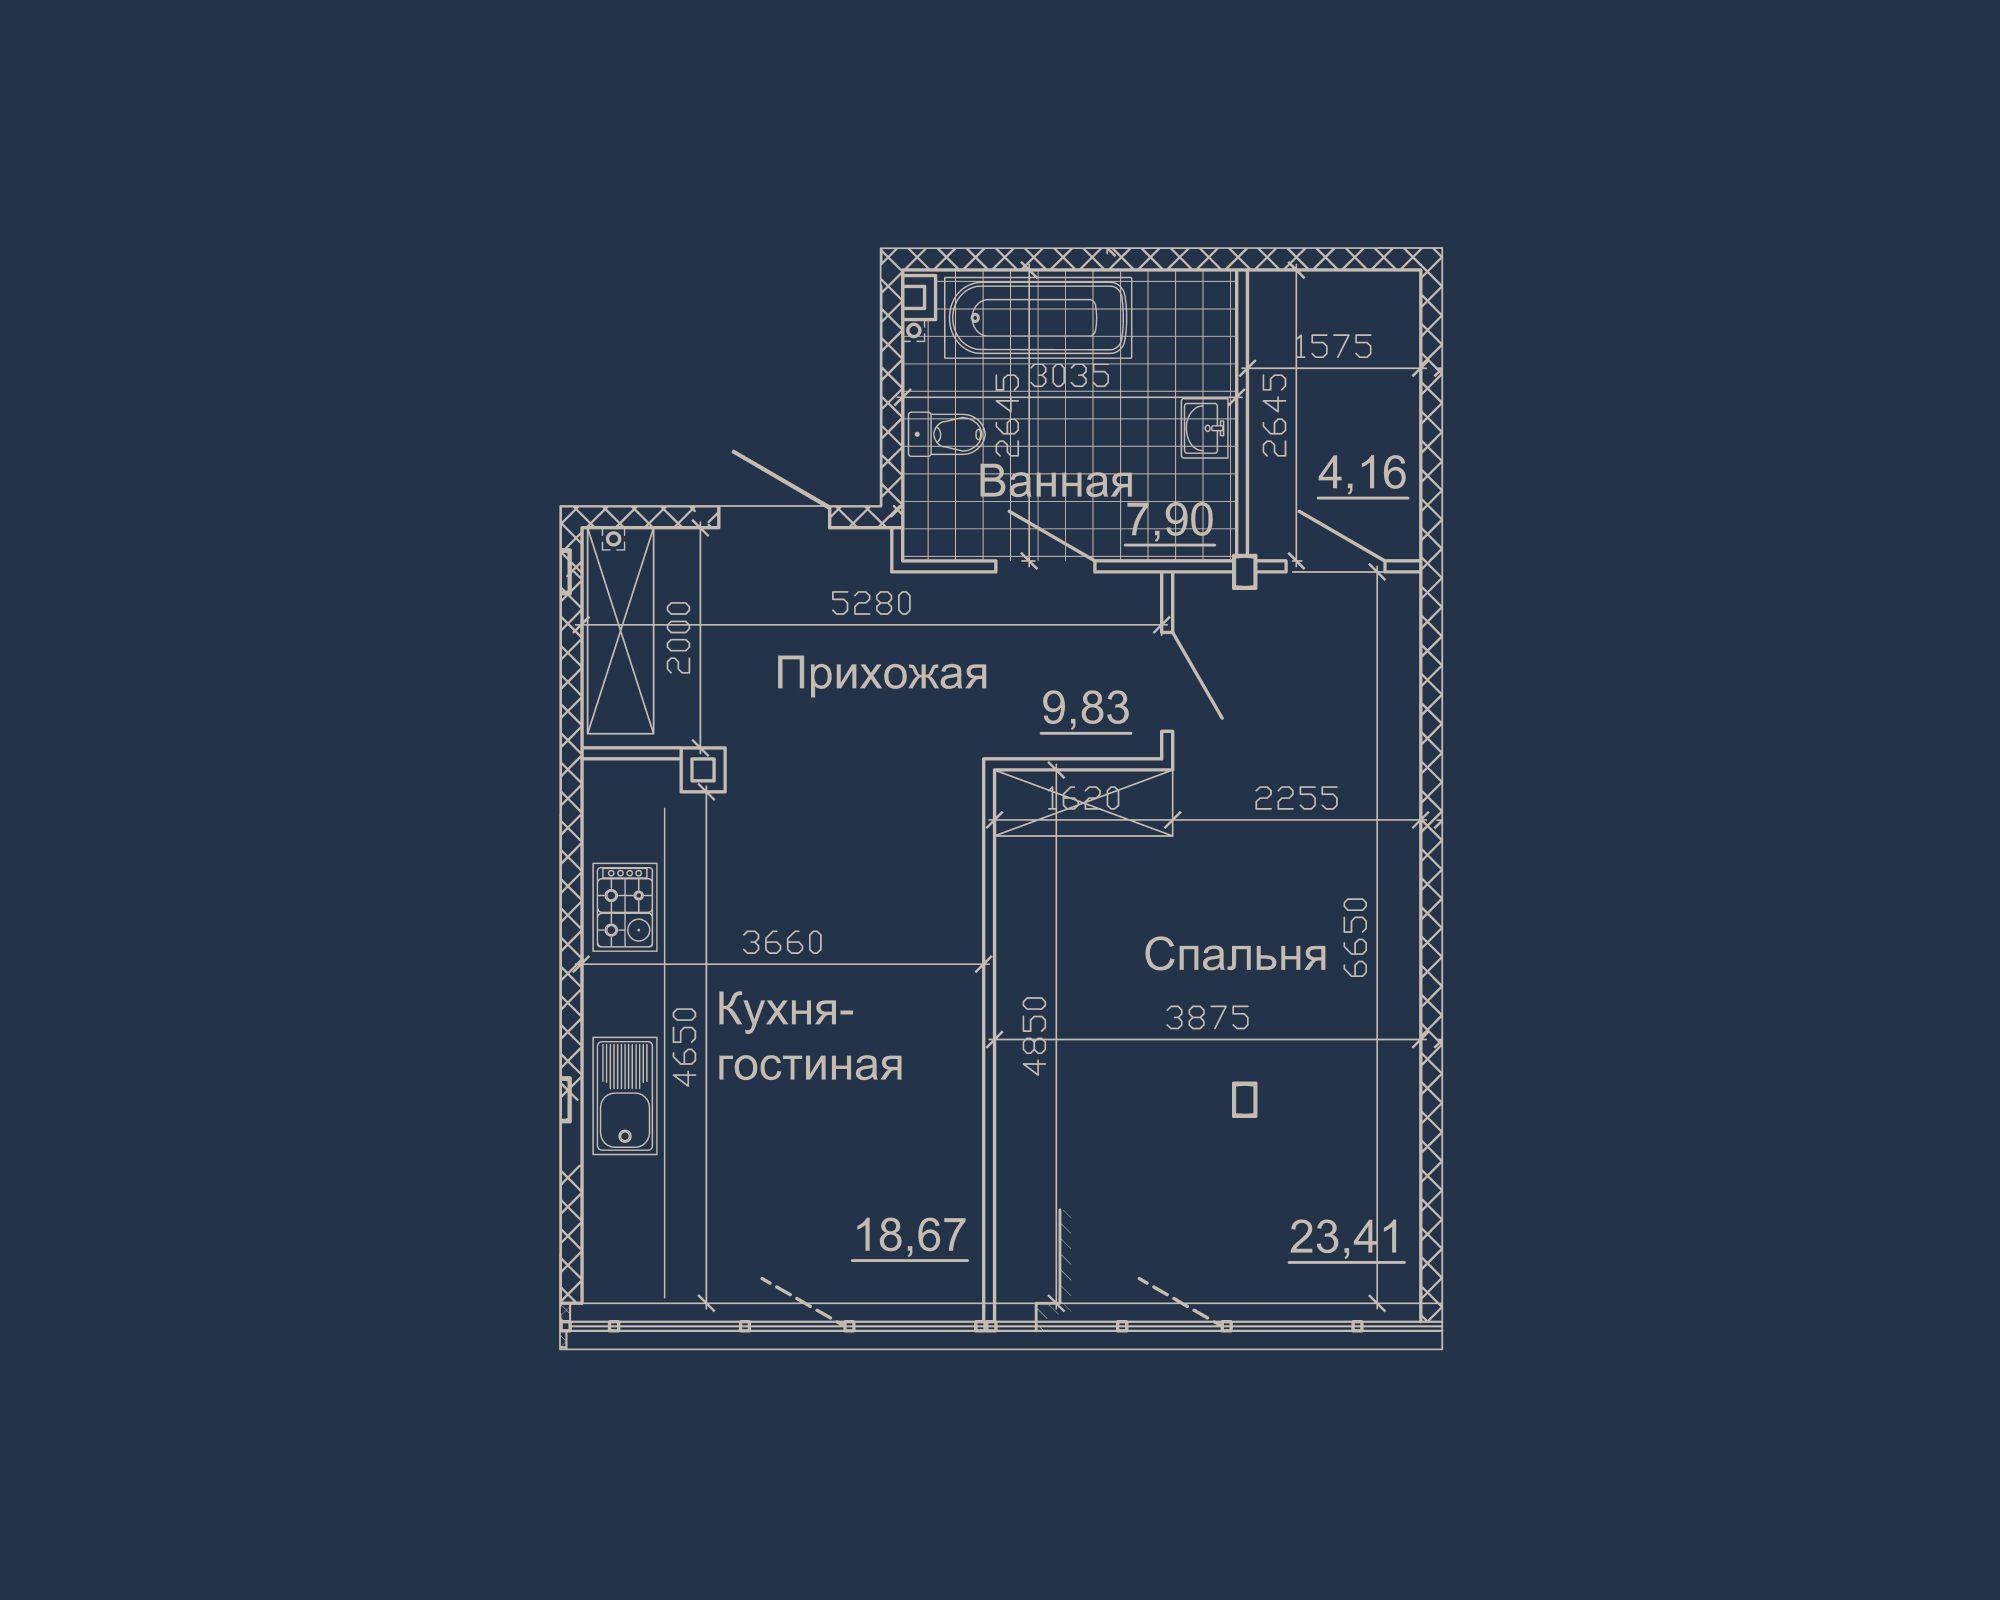 1-кімнатна квартира типу 08А у ЖК Nebo